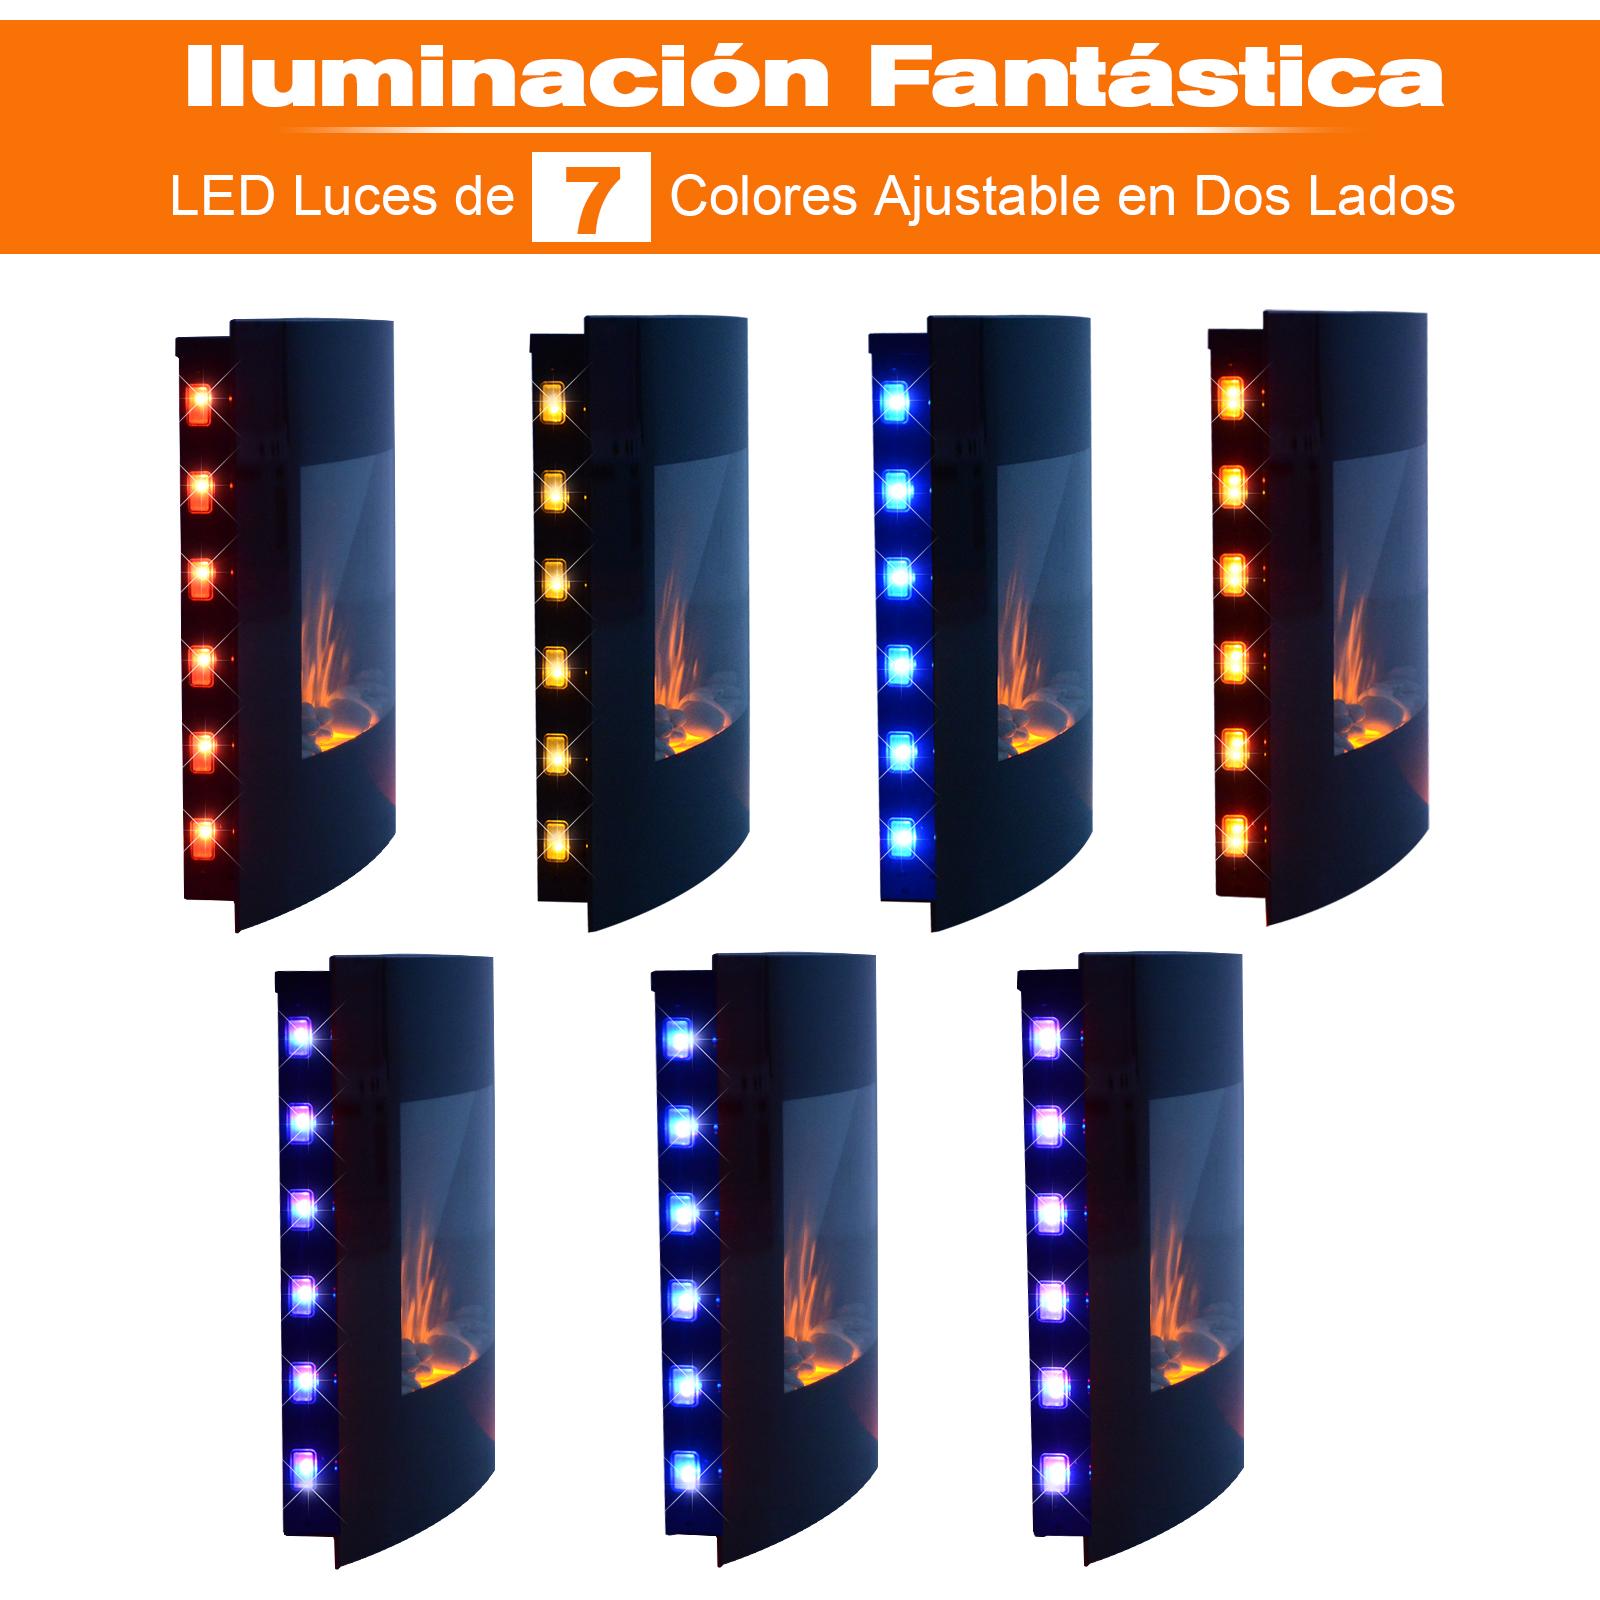 Chimenea-Electrica-de-Pared-Vertical-Estufas-Electricas-Llama-LED-6-Tipos-Nuevo miniatura 38